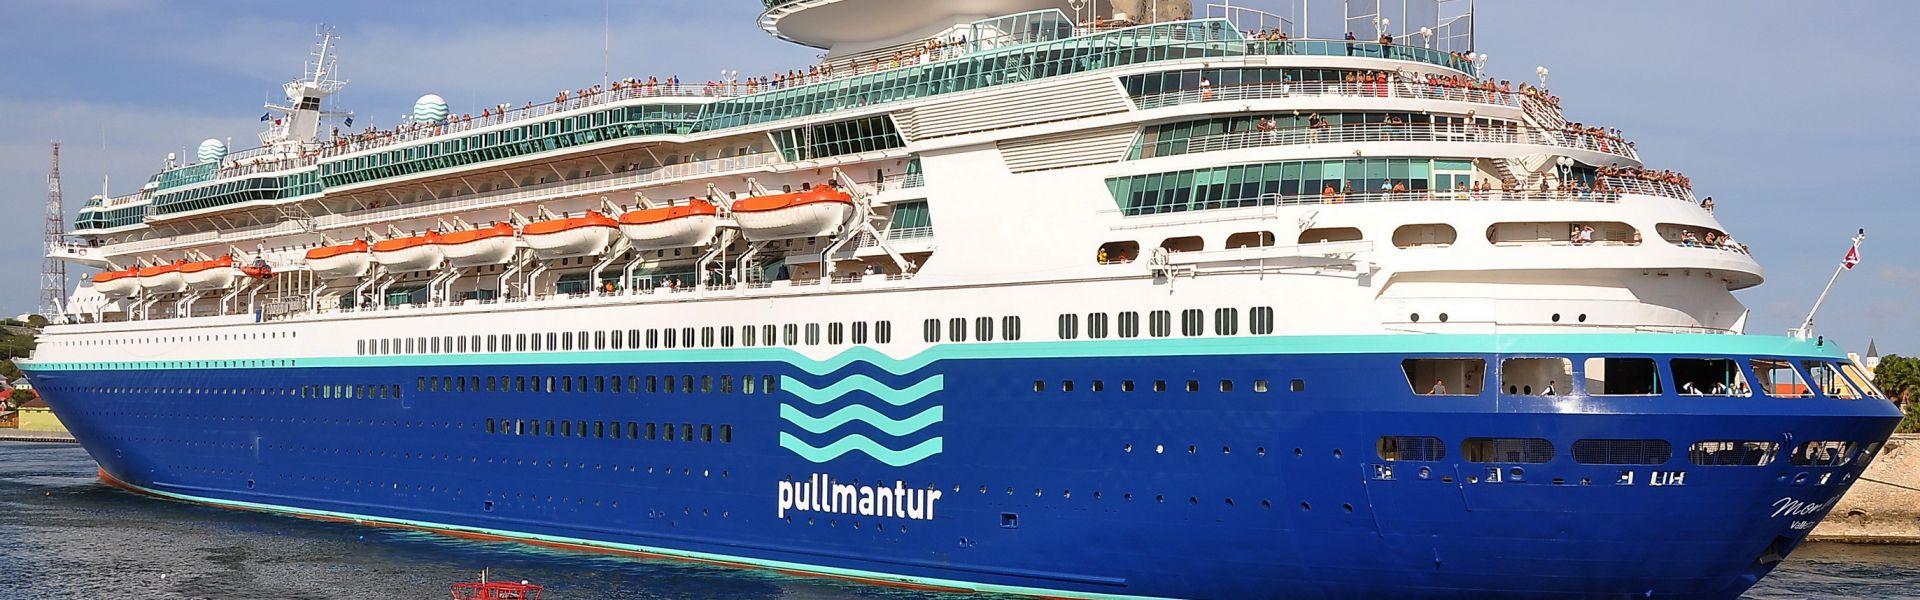 Croaziera 2017 - Europa de Vest (Lisabona) - Pullmantur Cruises - Monarch - 9 nopti